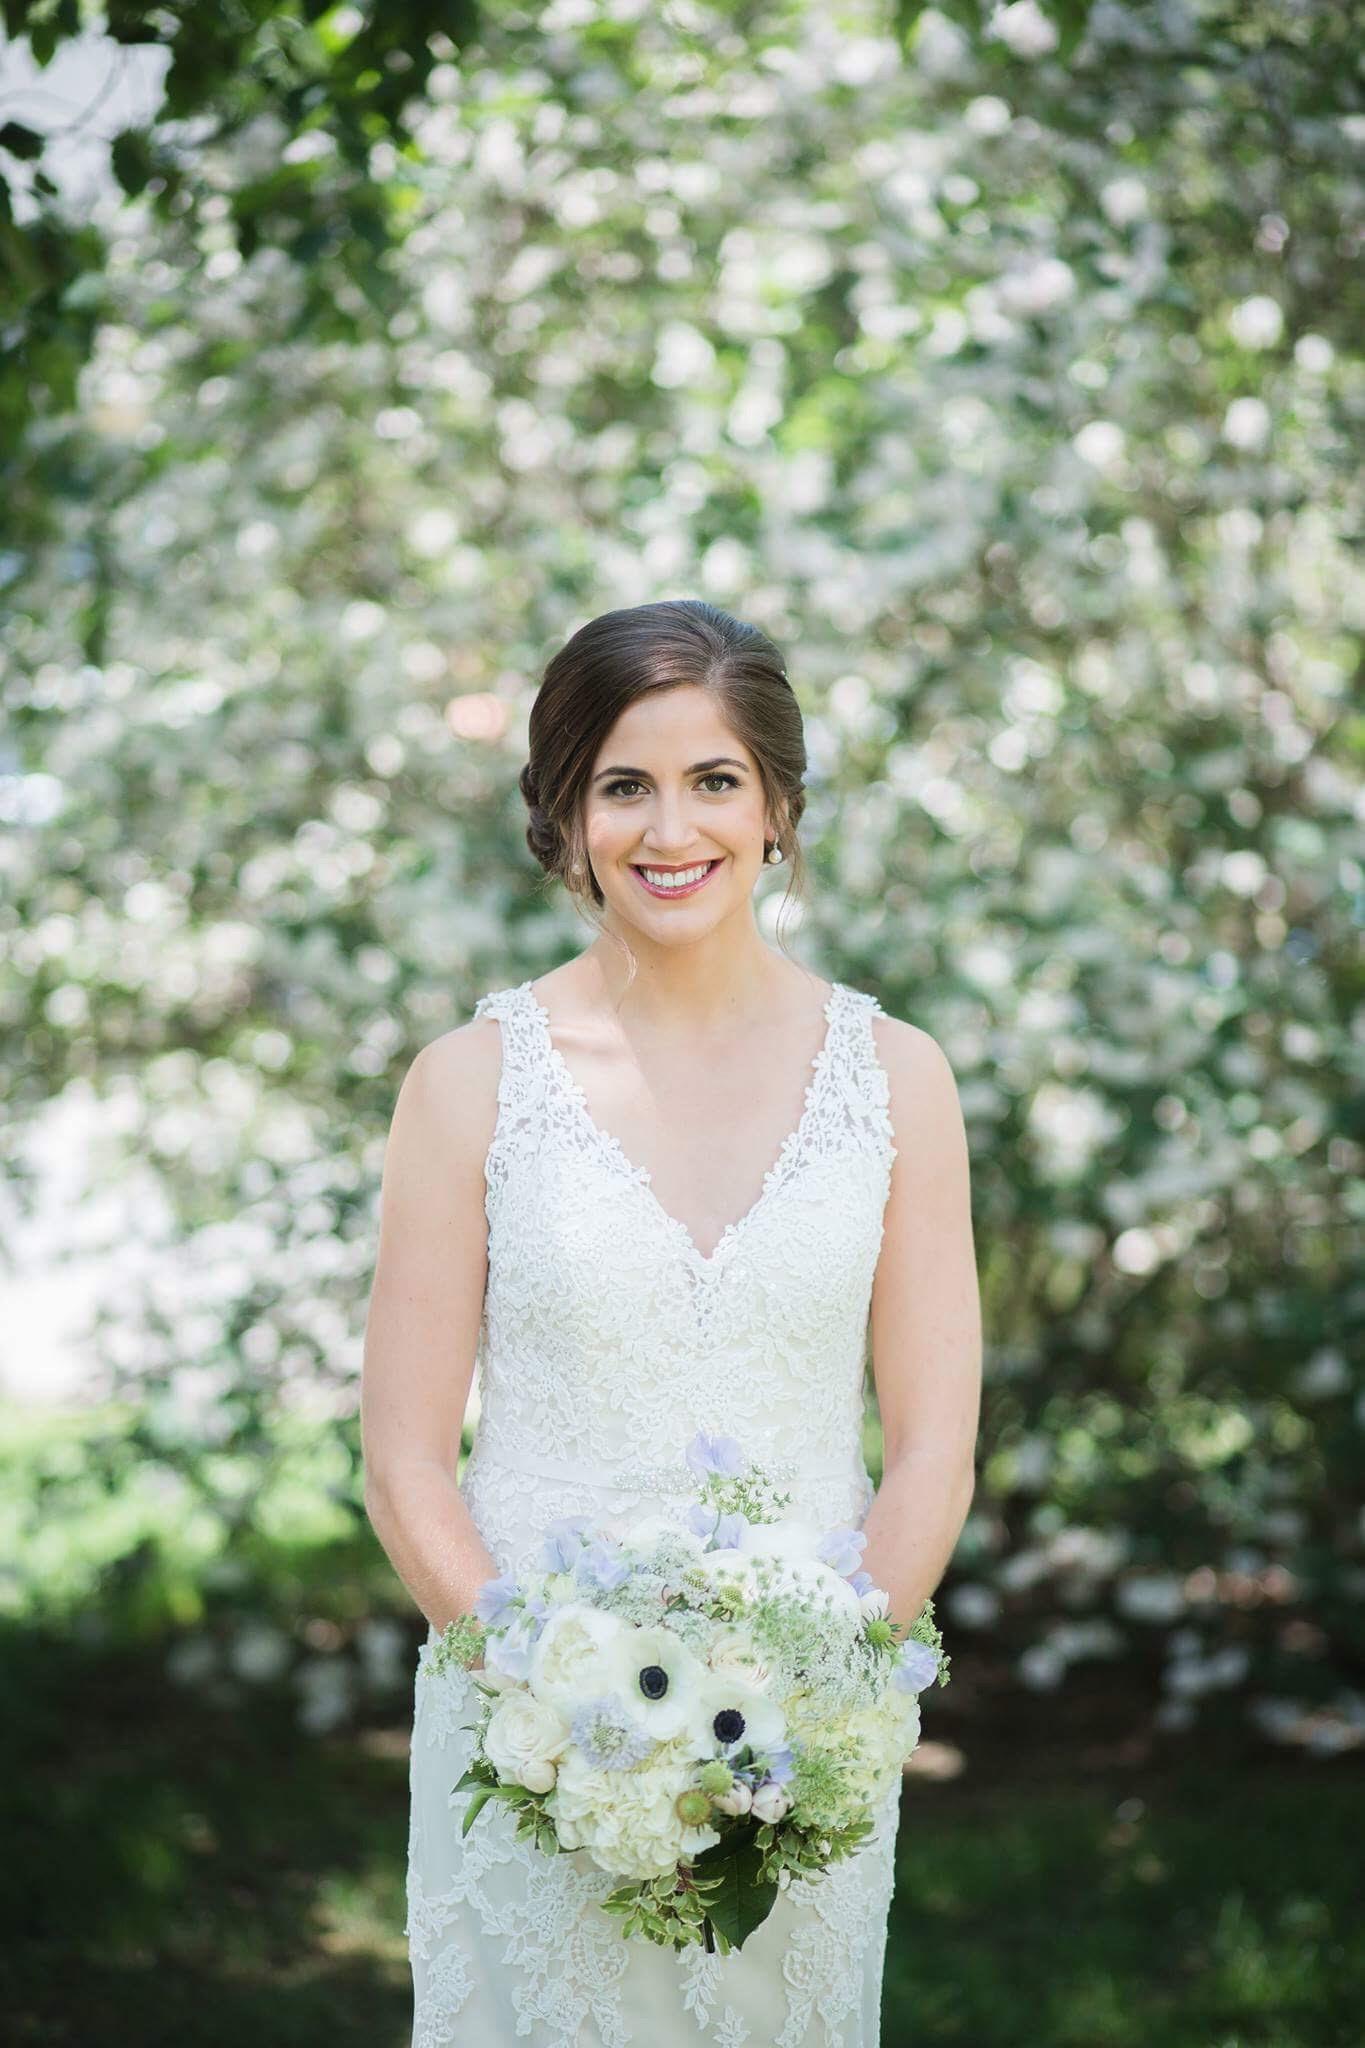 bride emma Levine / photography Chelsea bos photography / makeup by leah francesca